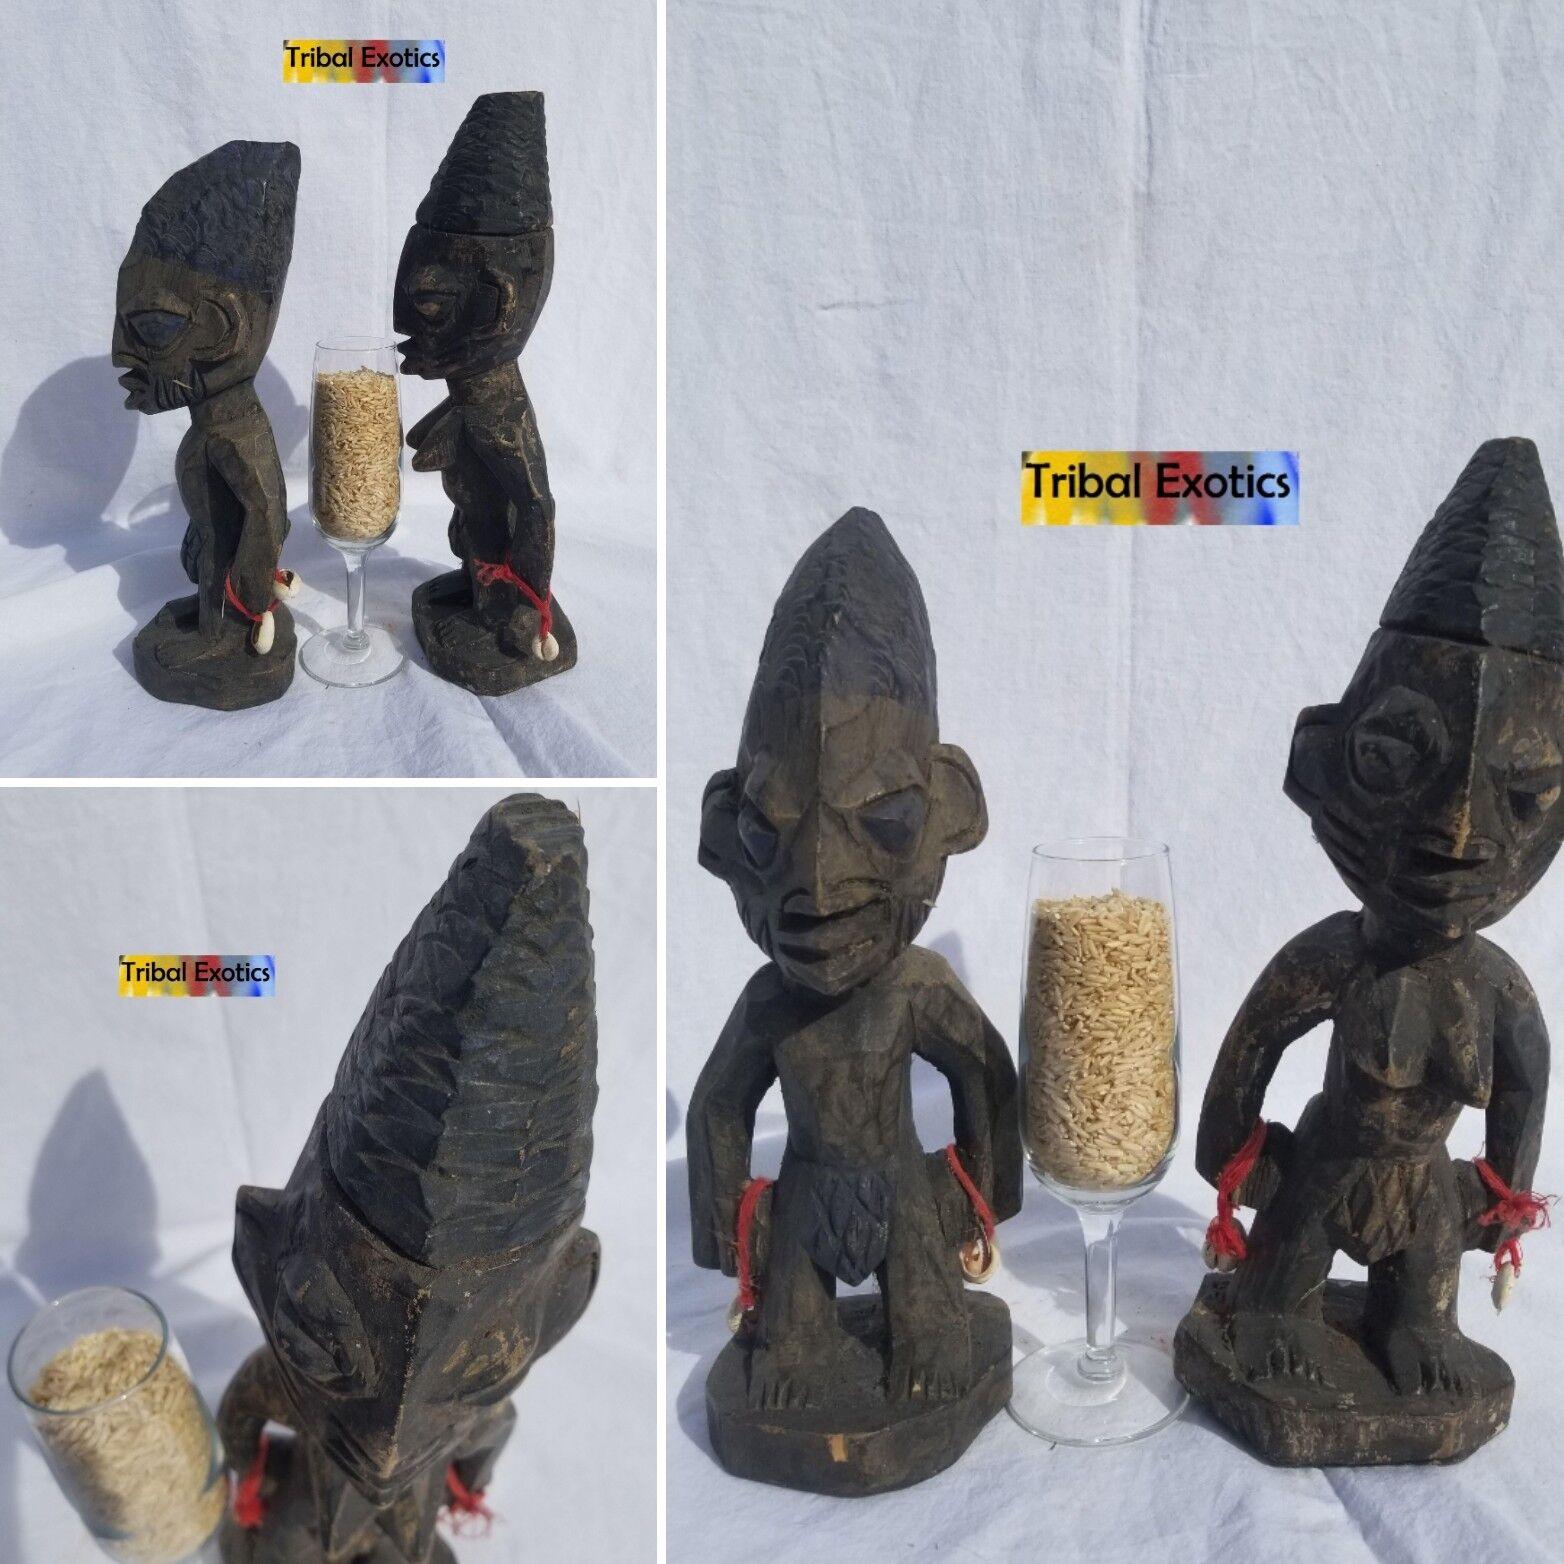 HALLOWED Yoruba Ibeji Twin Sculpture Statue Figure Mask Fine African Art